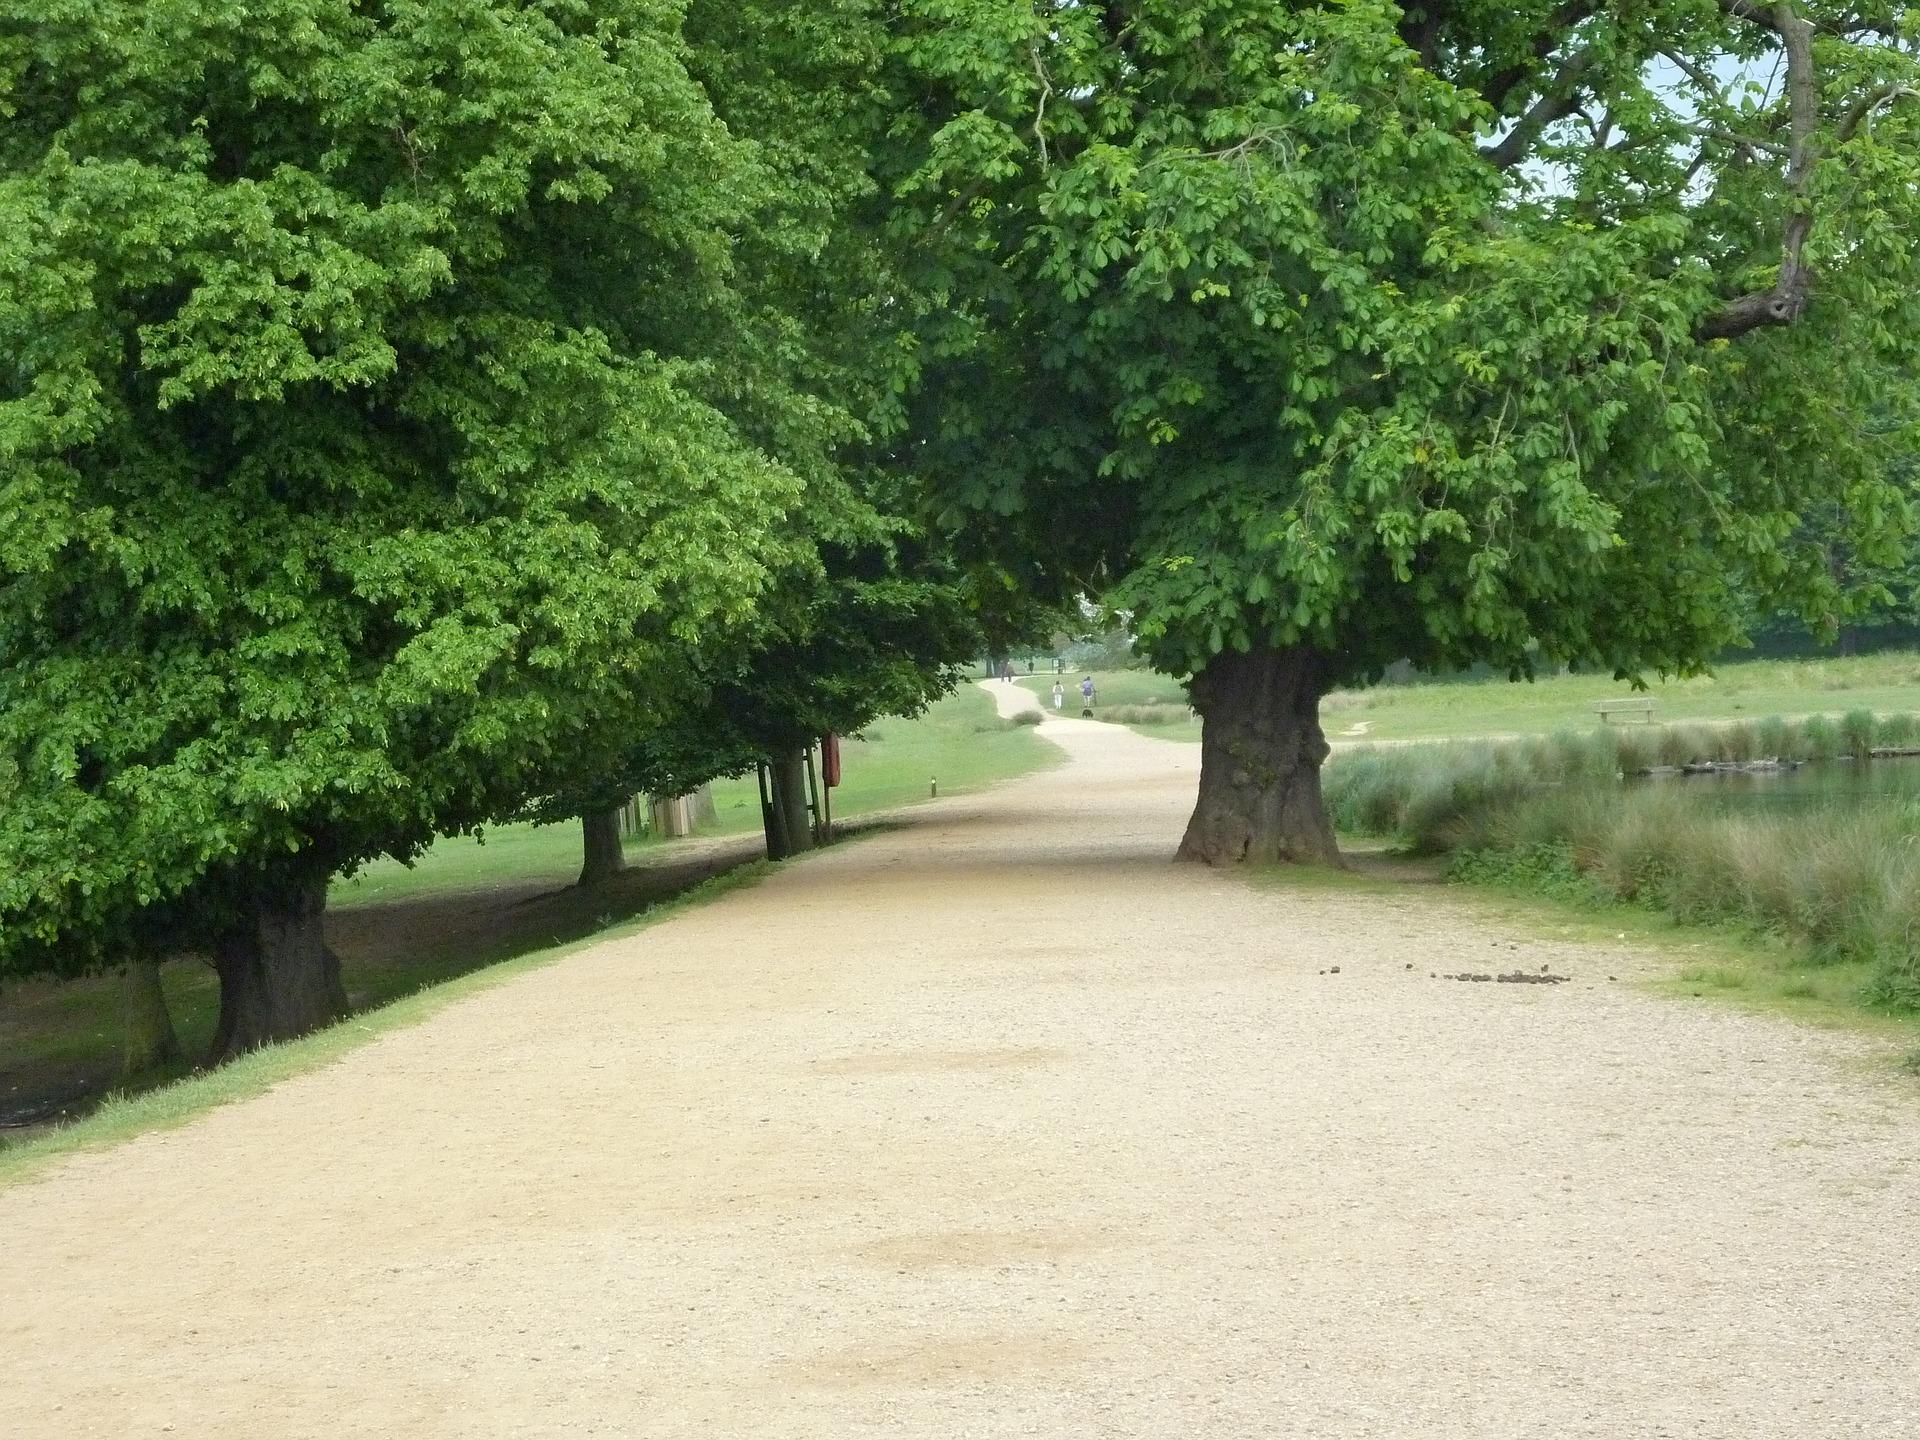 richmond-park-661652_1920